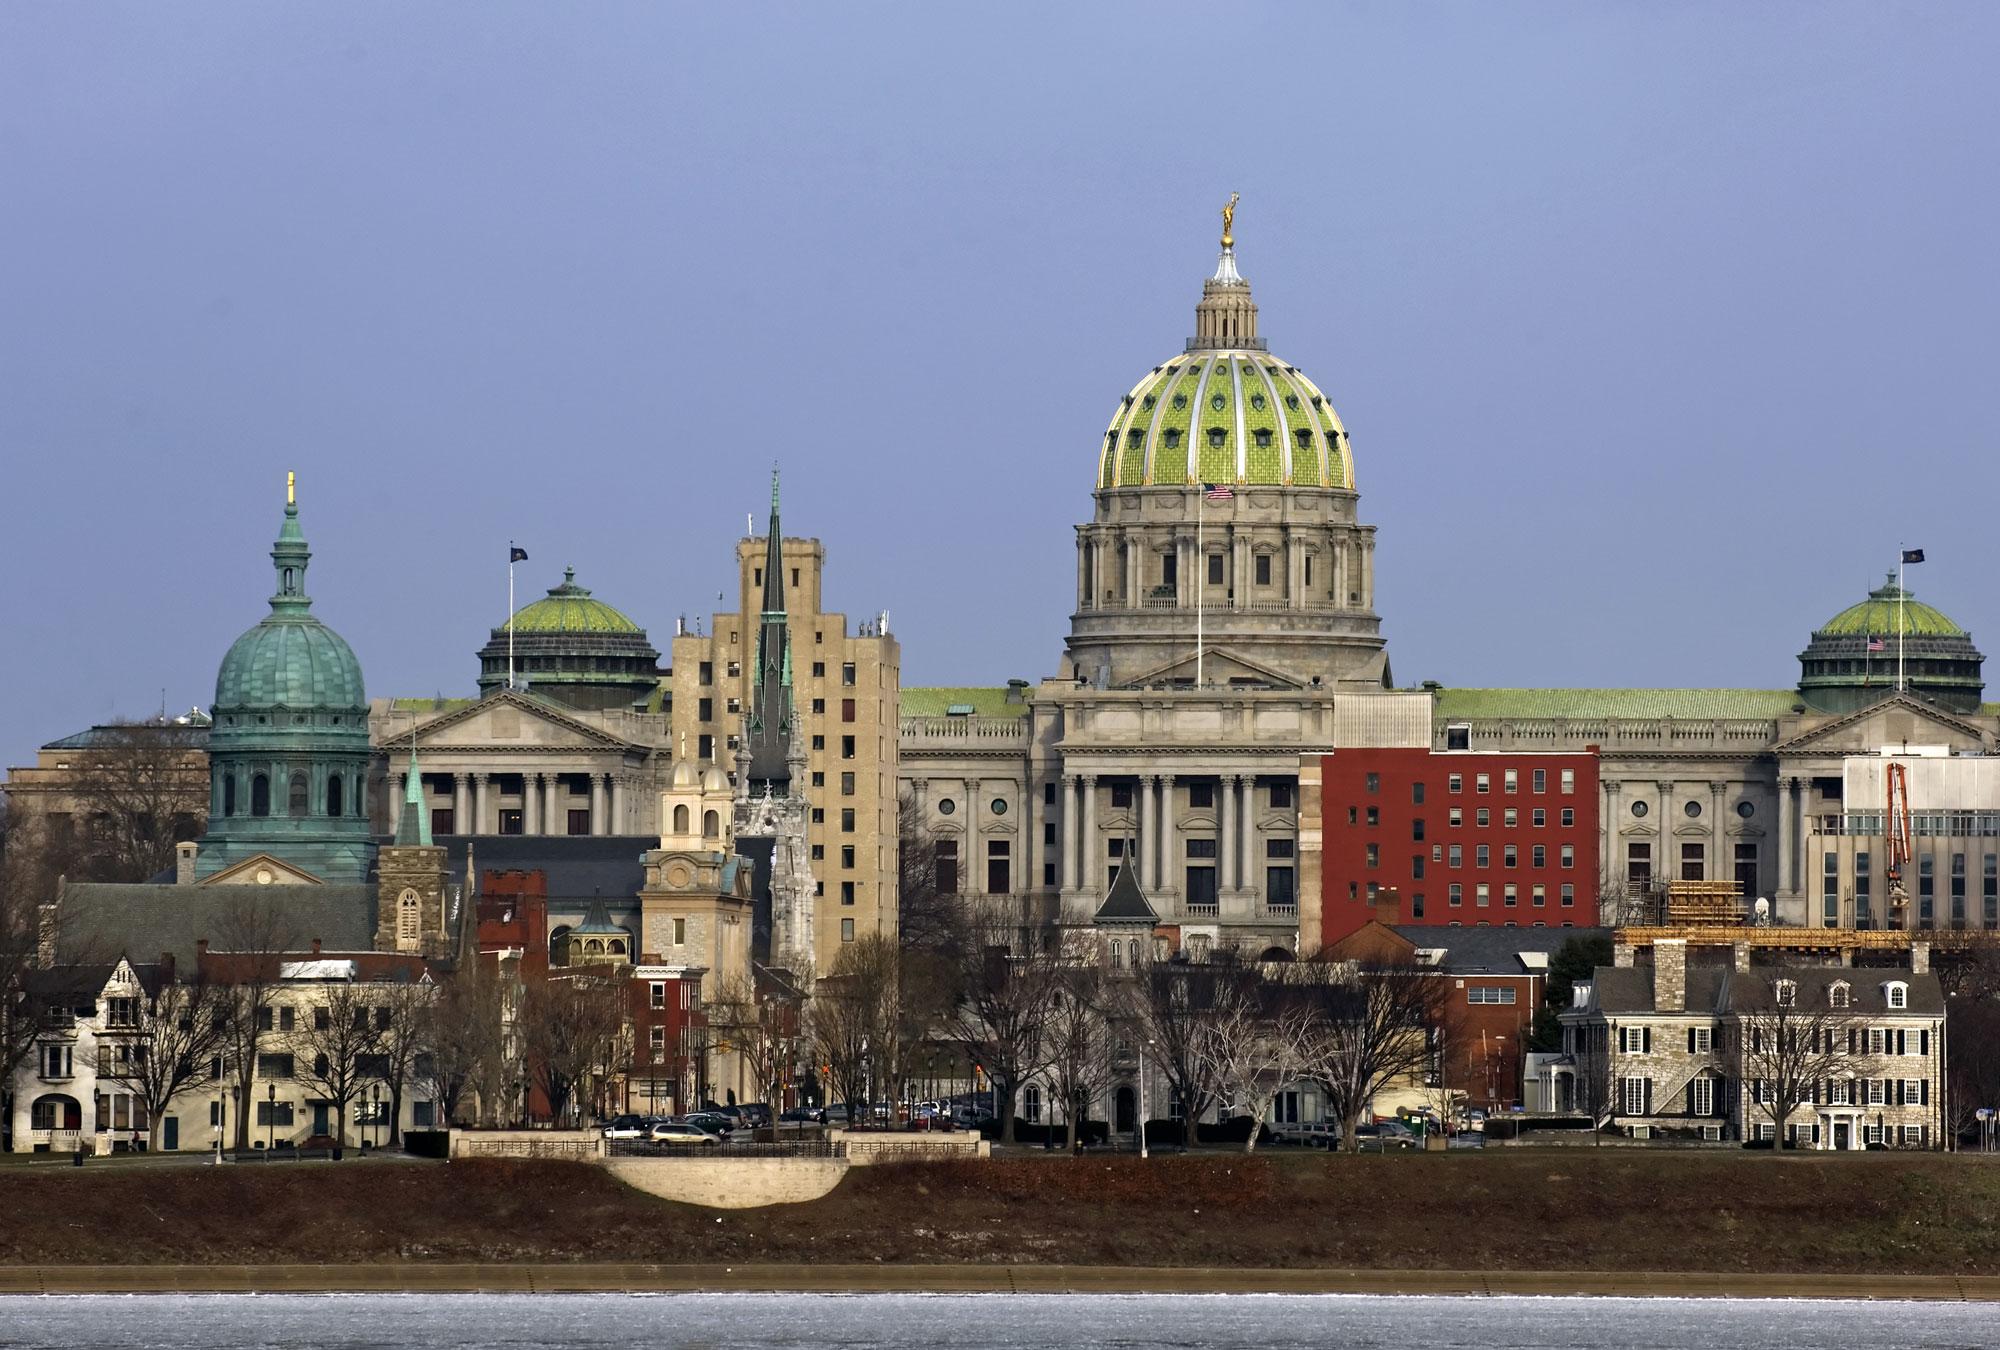 Pennsylvania state capitol building in Harrisburg, PA